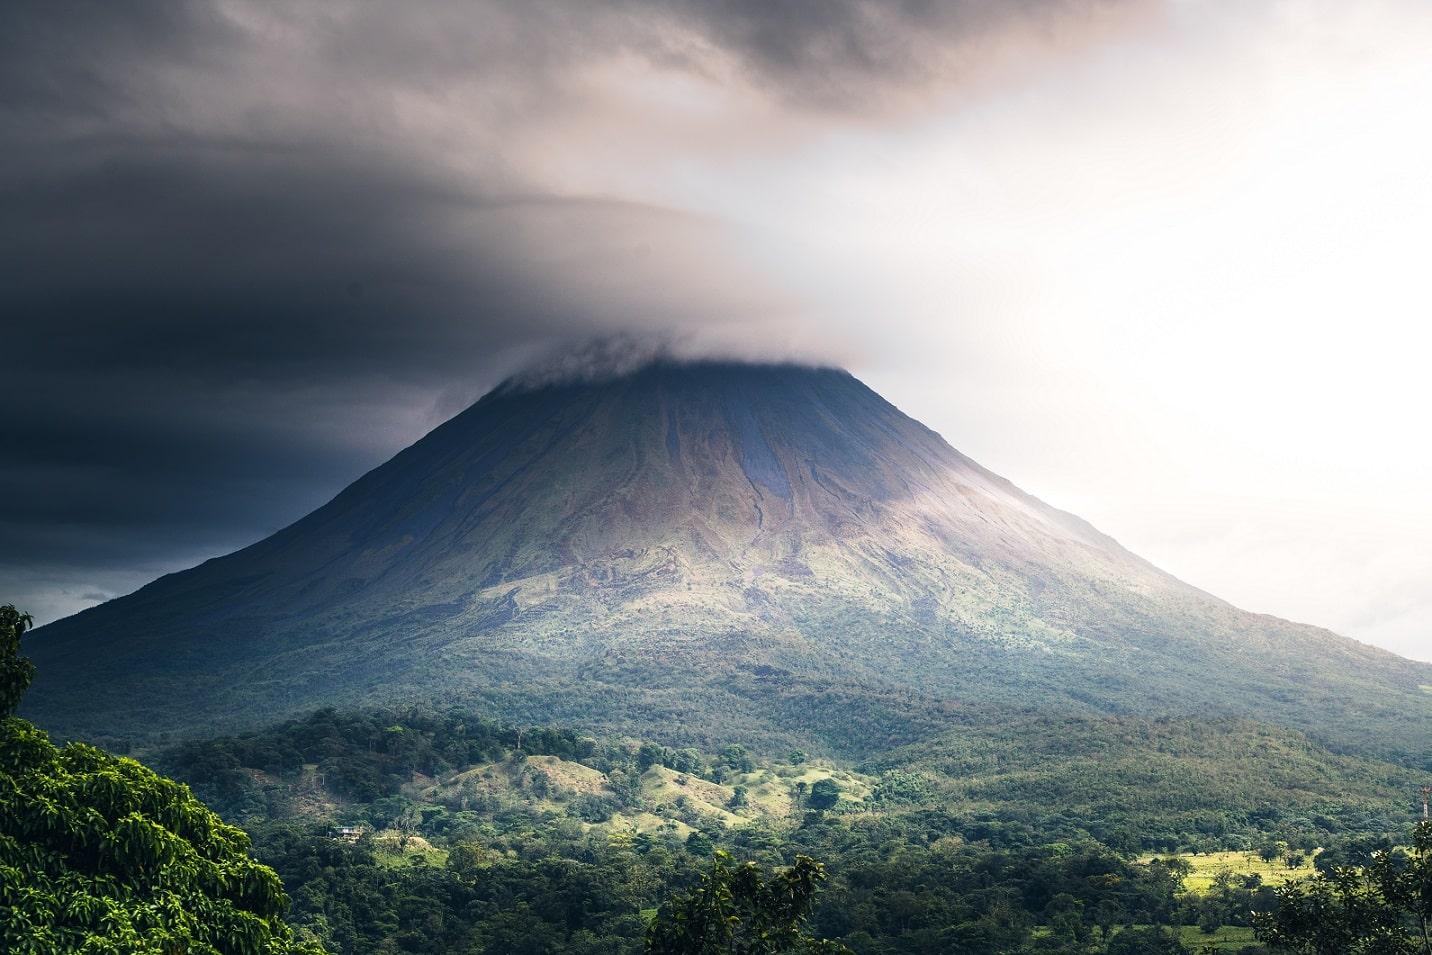 Arenal Volcano © Cosmic Timetraveler on Unsplash